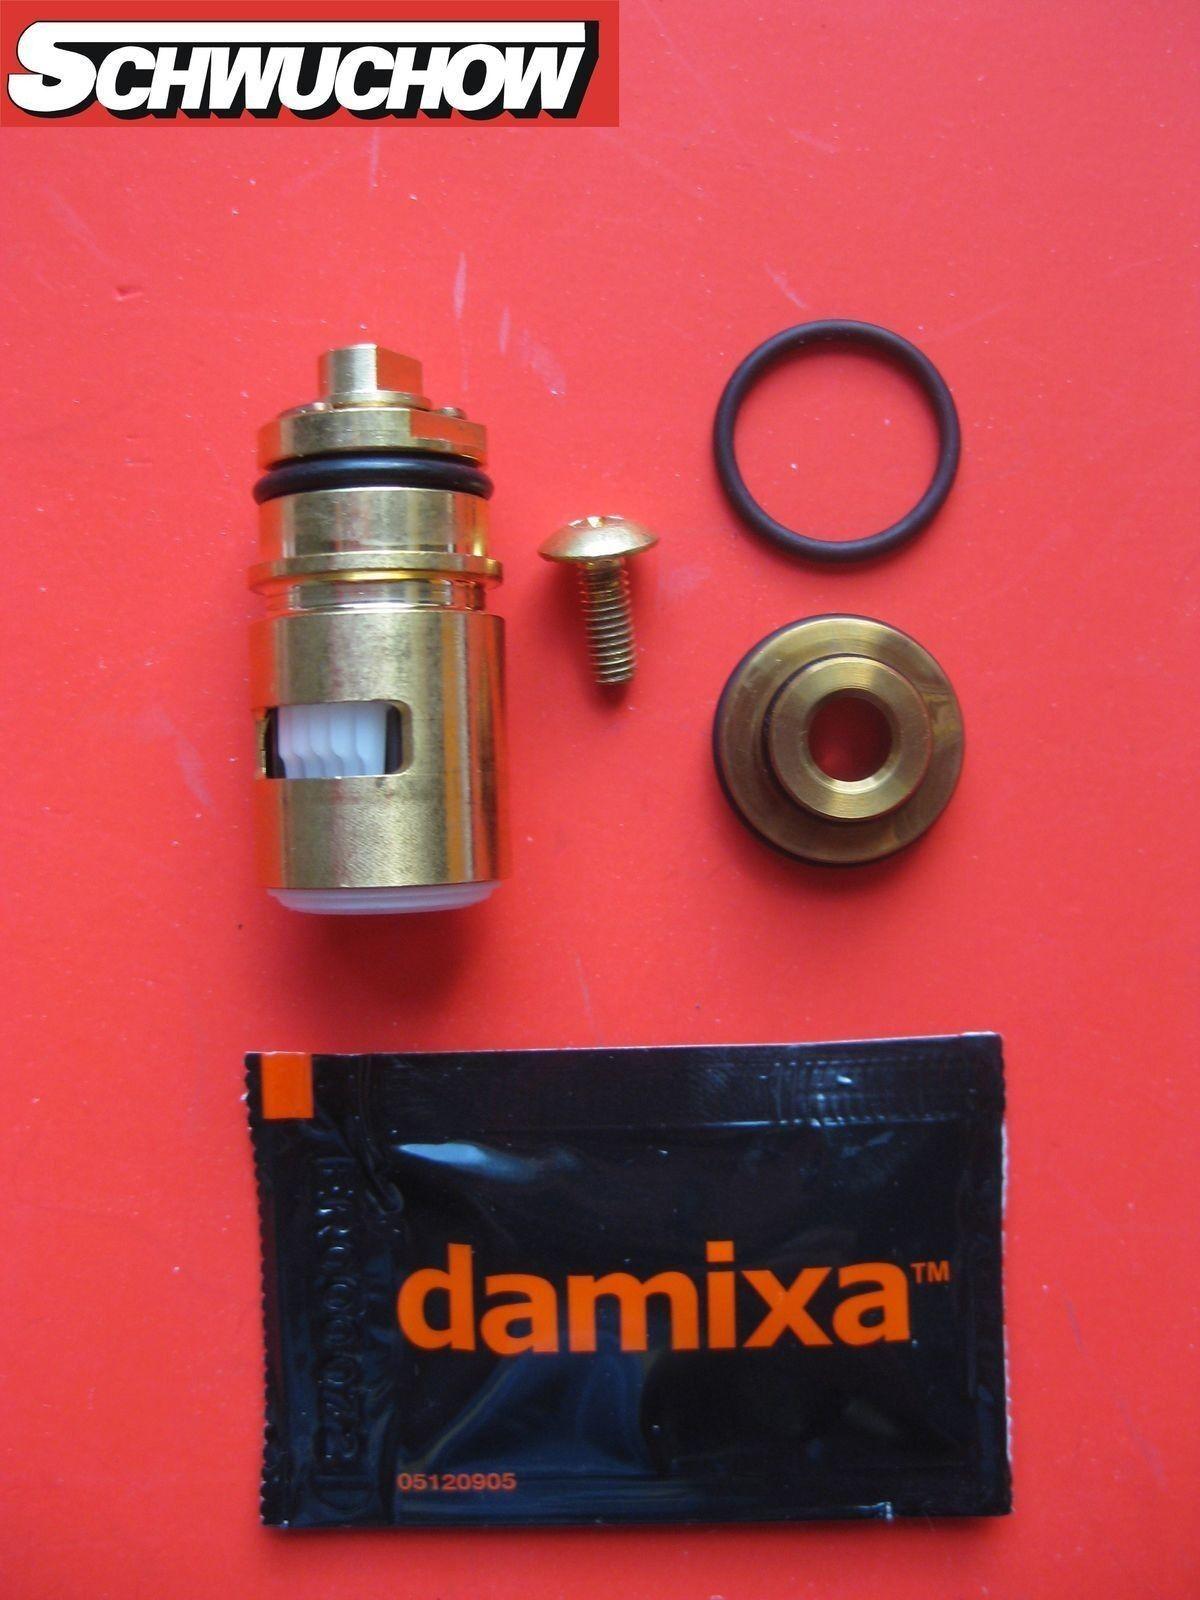 Damixa V3 0.Damixa Ceramic Cartridge 2316700 To G Type V3 0 Wash Basin Sink Tap